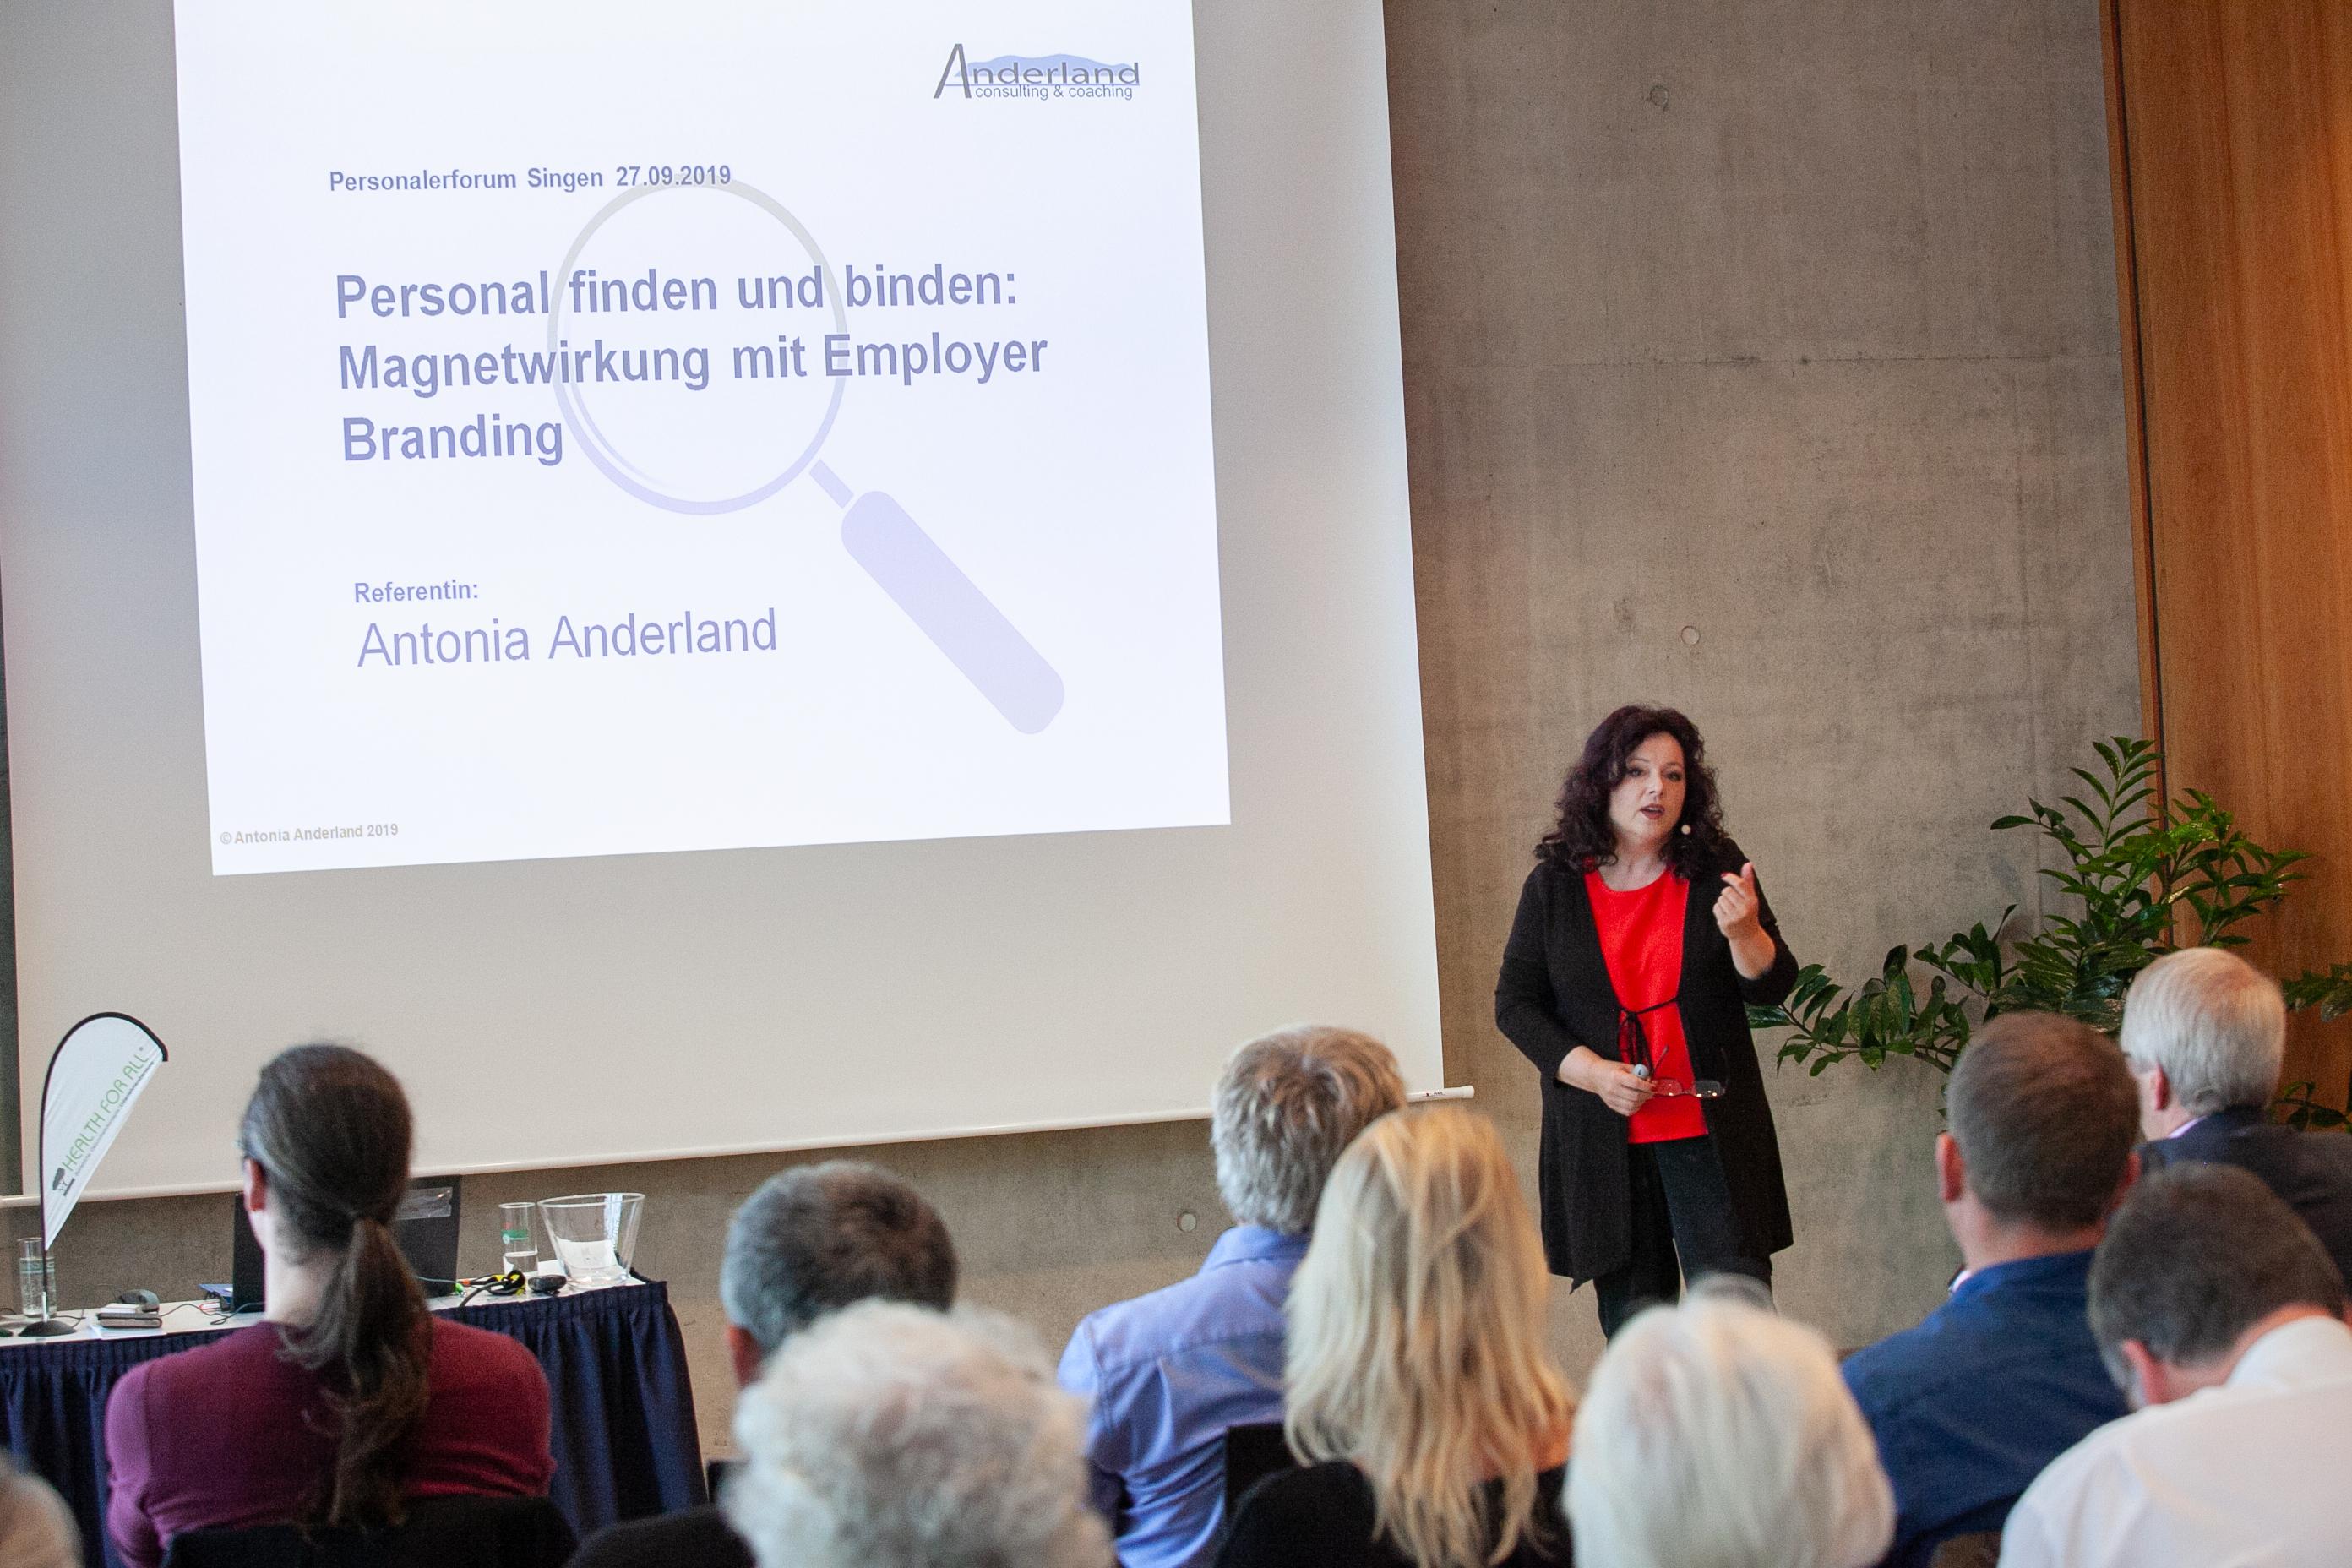 Referentin Antonia Anderland